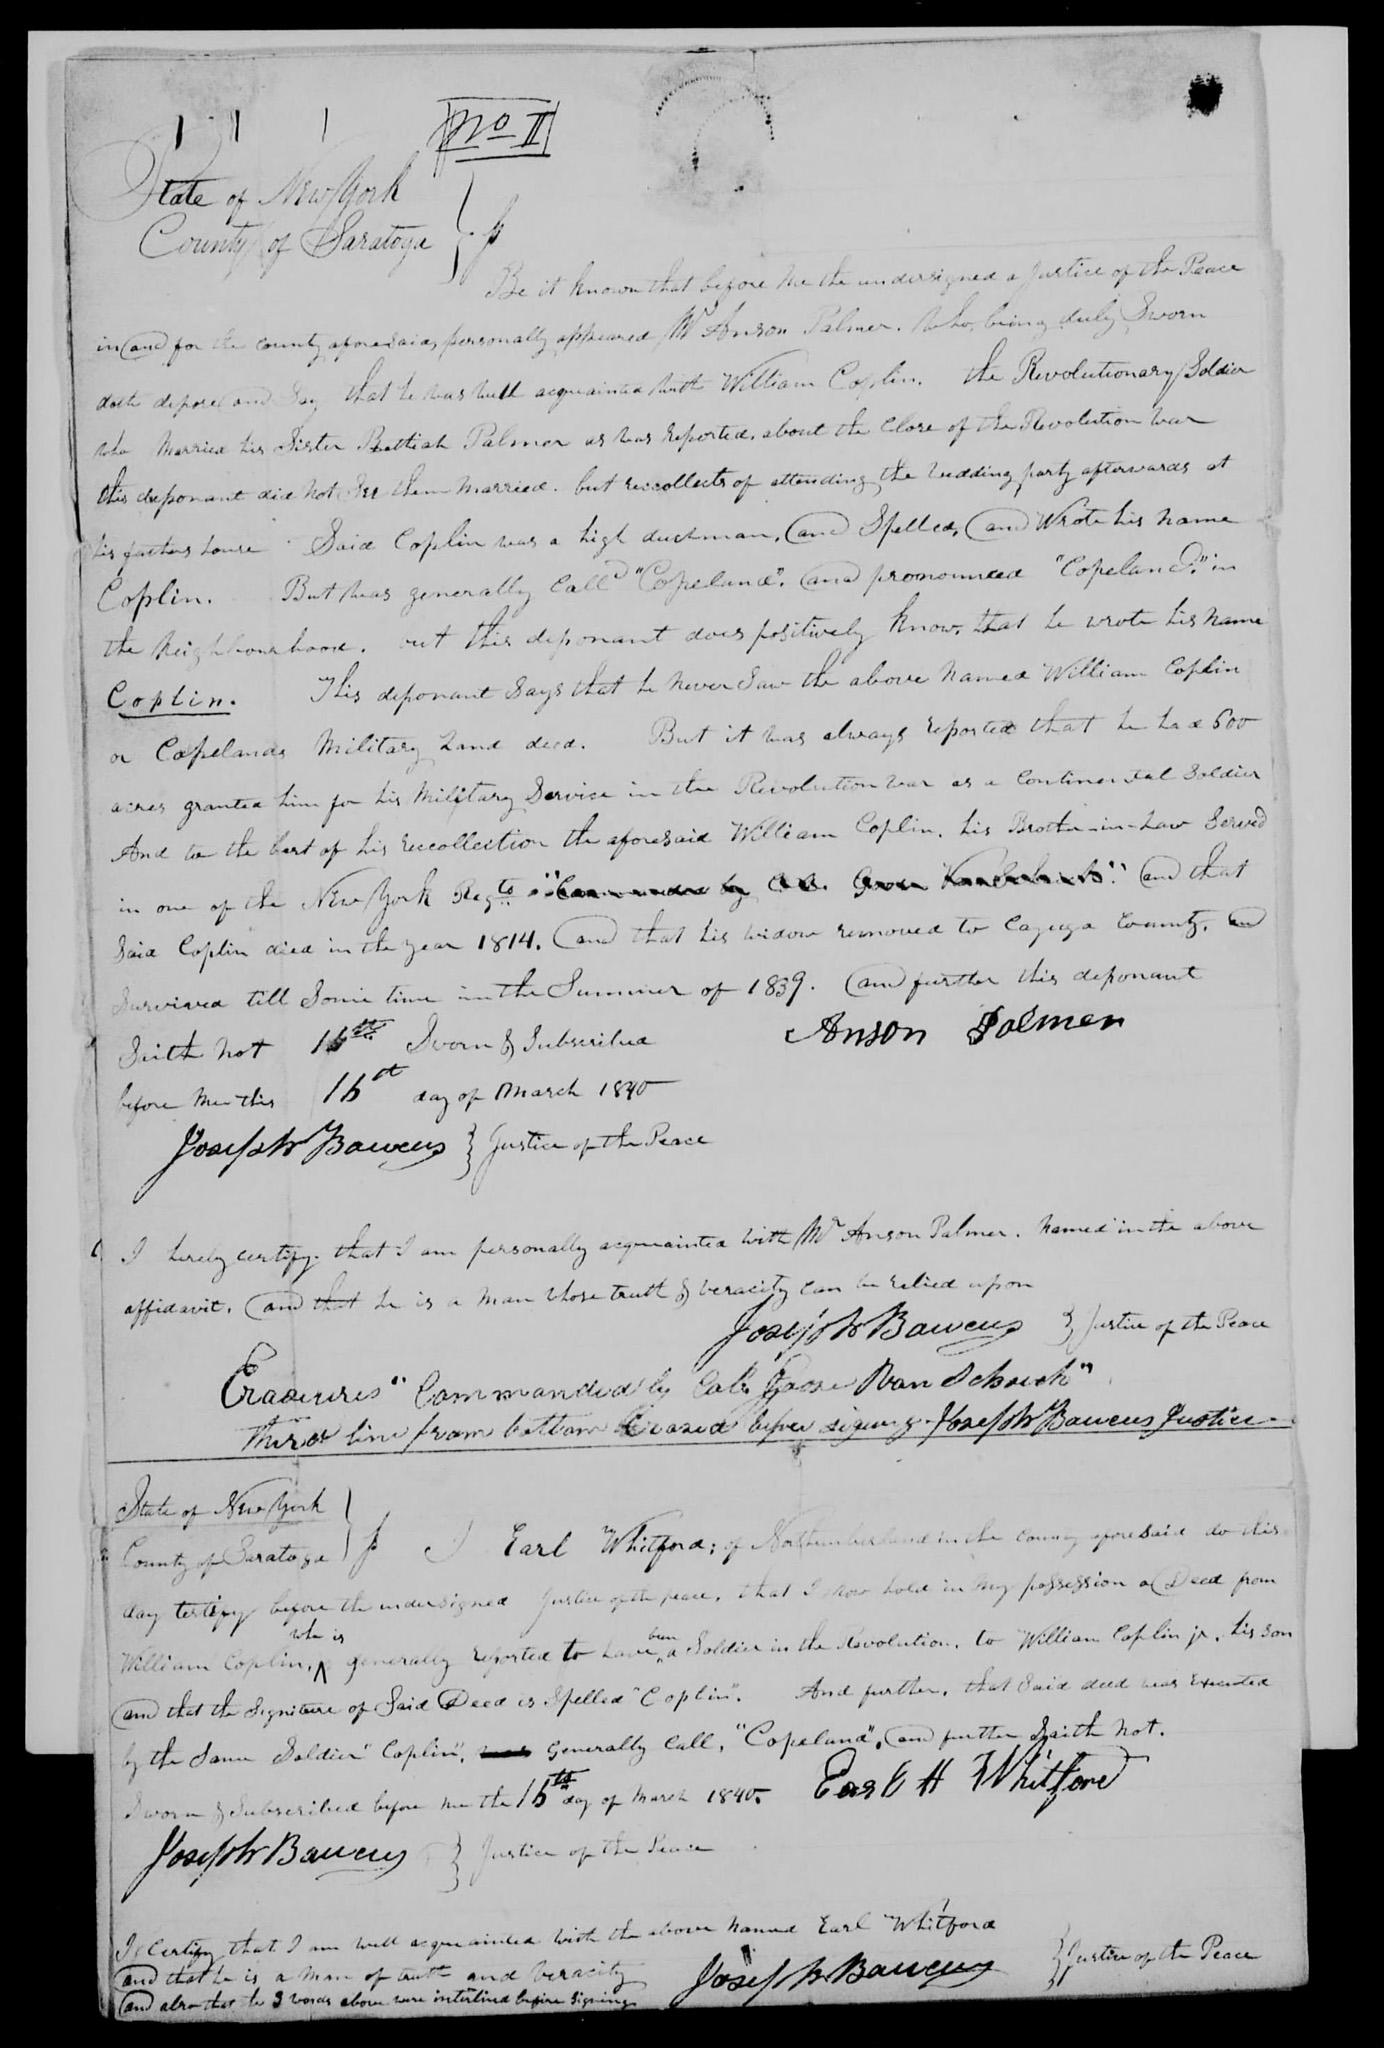 Anson Palmer affidavit on 16 Mar 1840